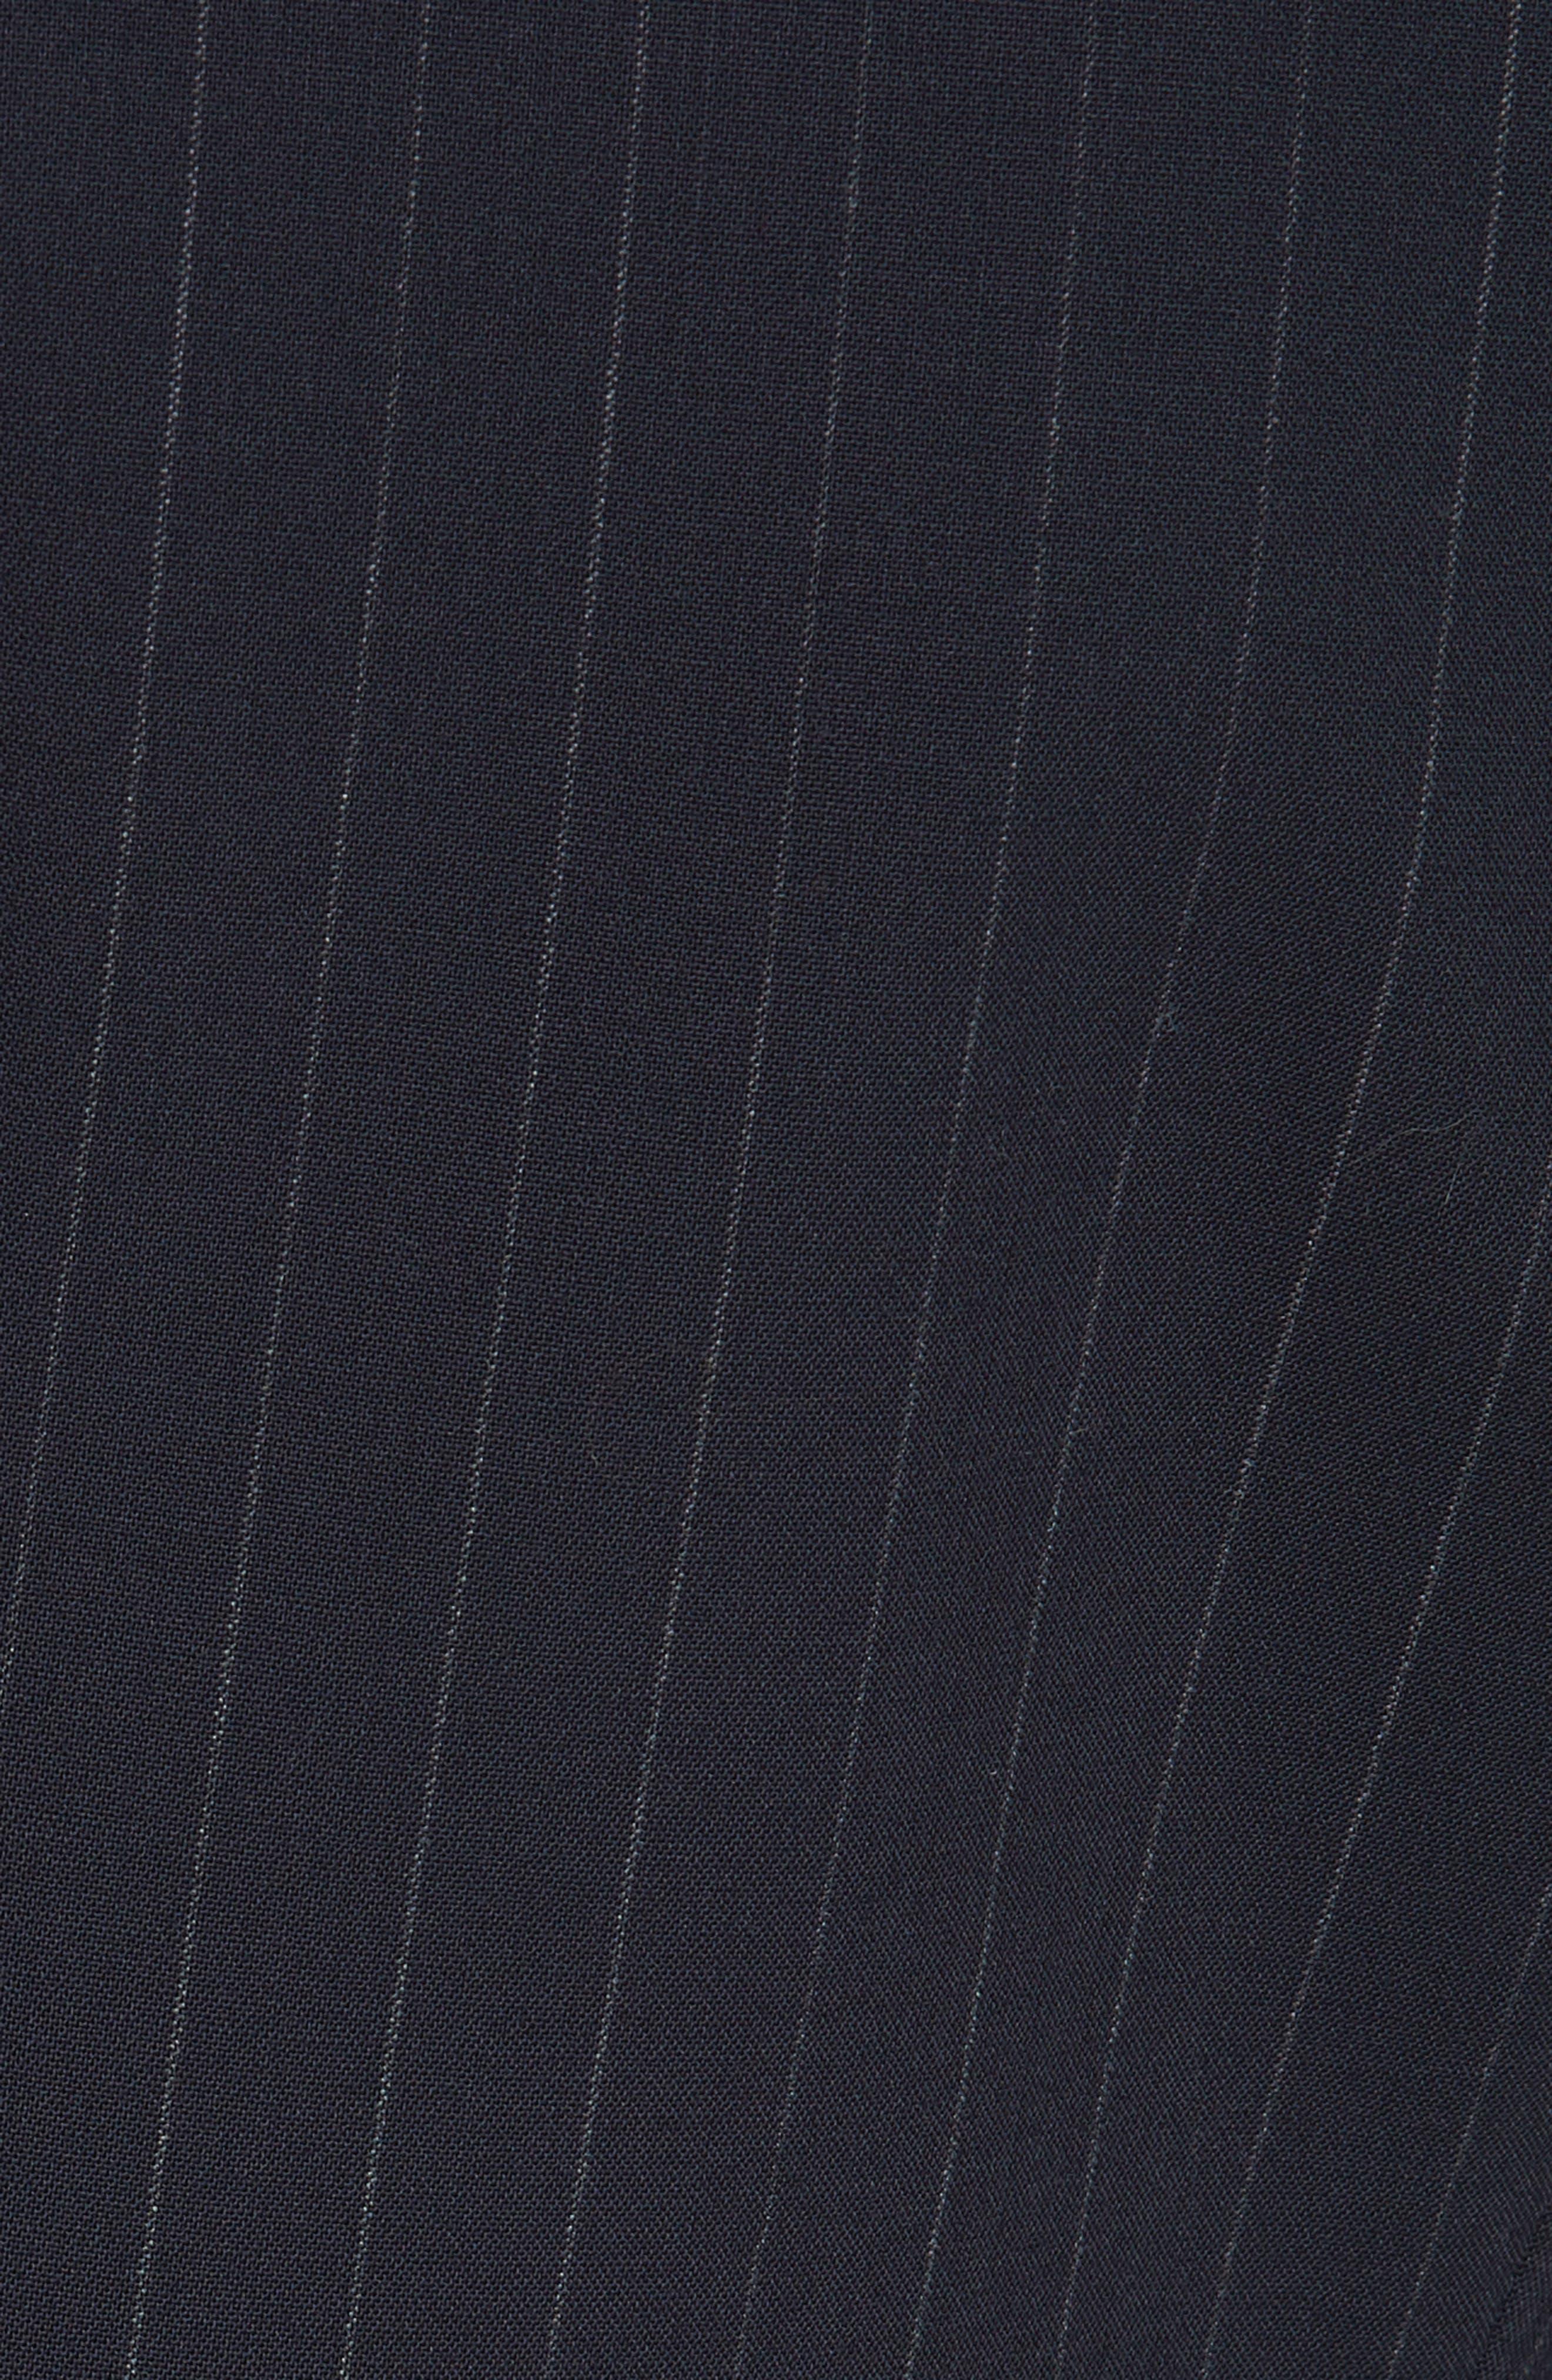 Etienette B Good Wool Suit Jacket,                             Alternate thumbnail 43, color,